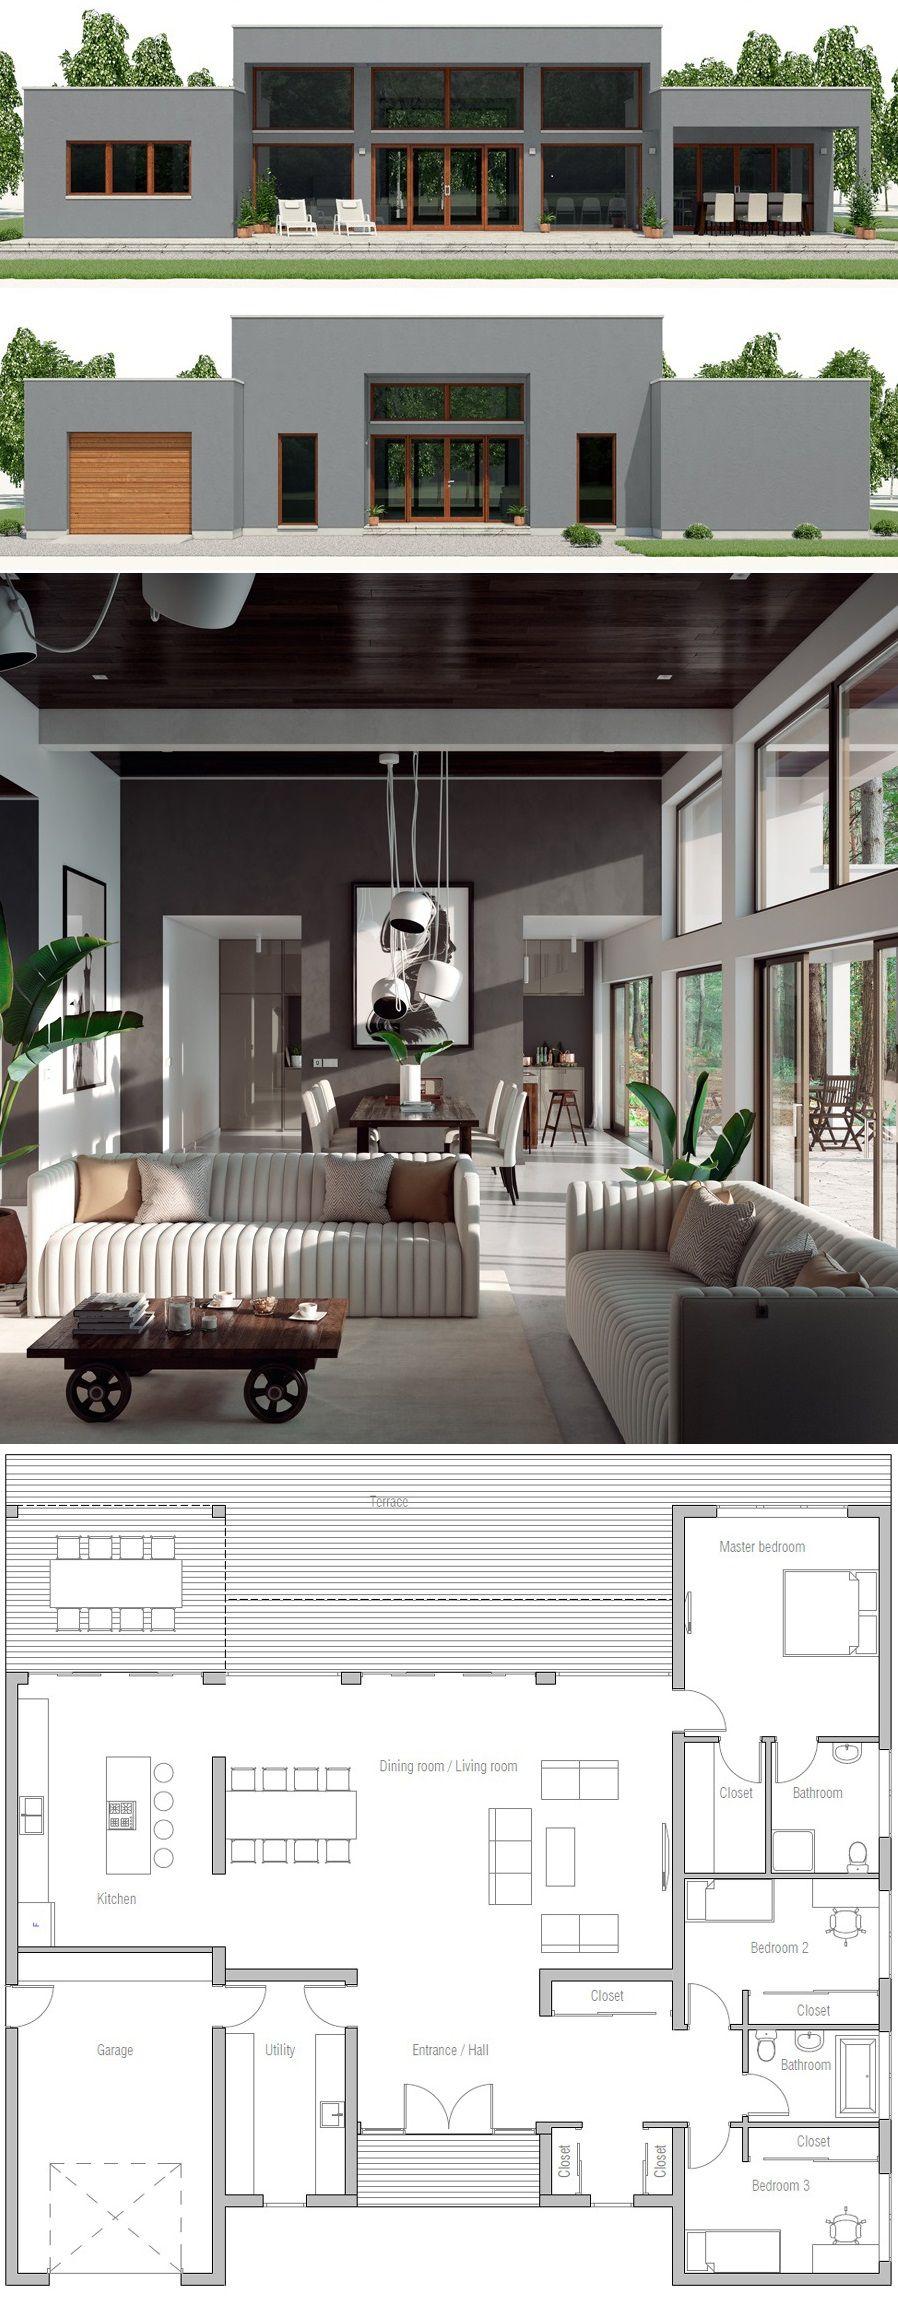 House Design Ch531 New House Plans Contemporary House Plans Dream House Plans